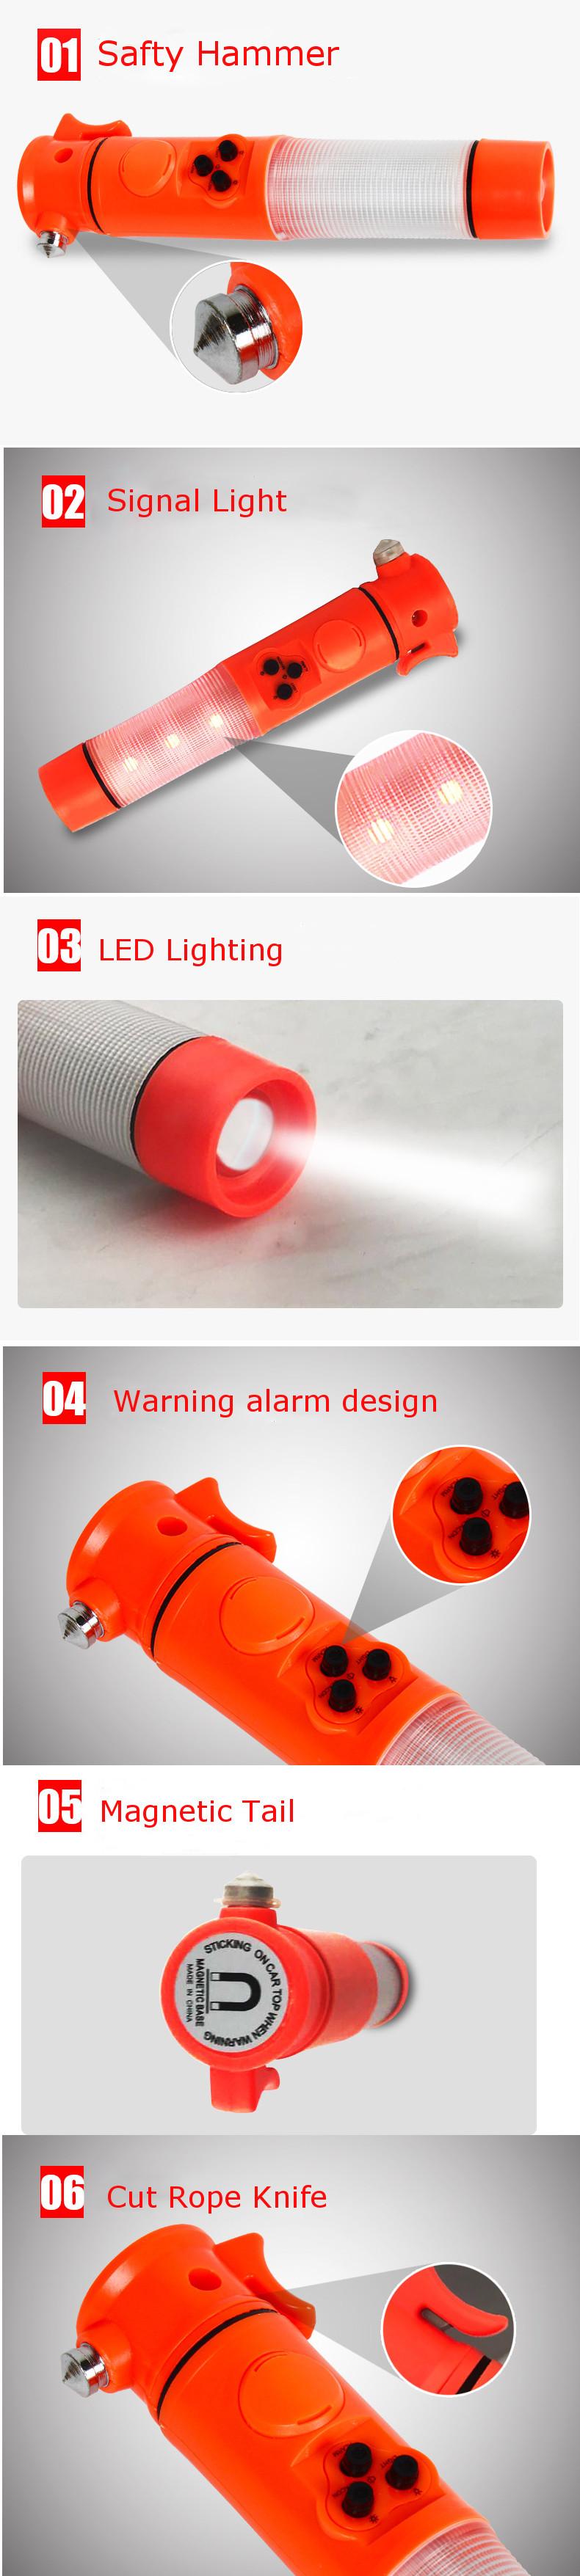 XANES U14 500Lumens Easy Operation Magnetic Head LED Flashlight & Signal Light with Alarm & Safety Hammer & Cut Rope Knife